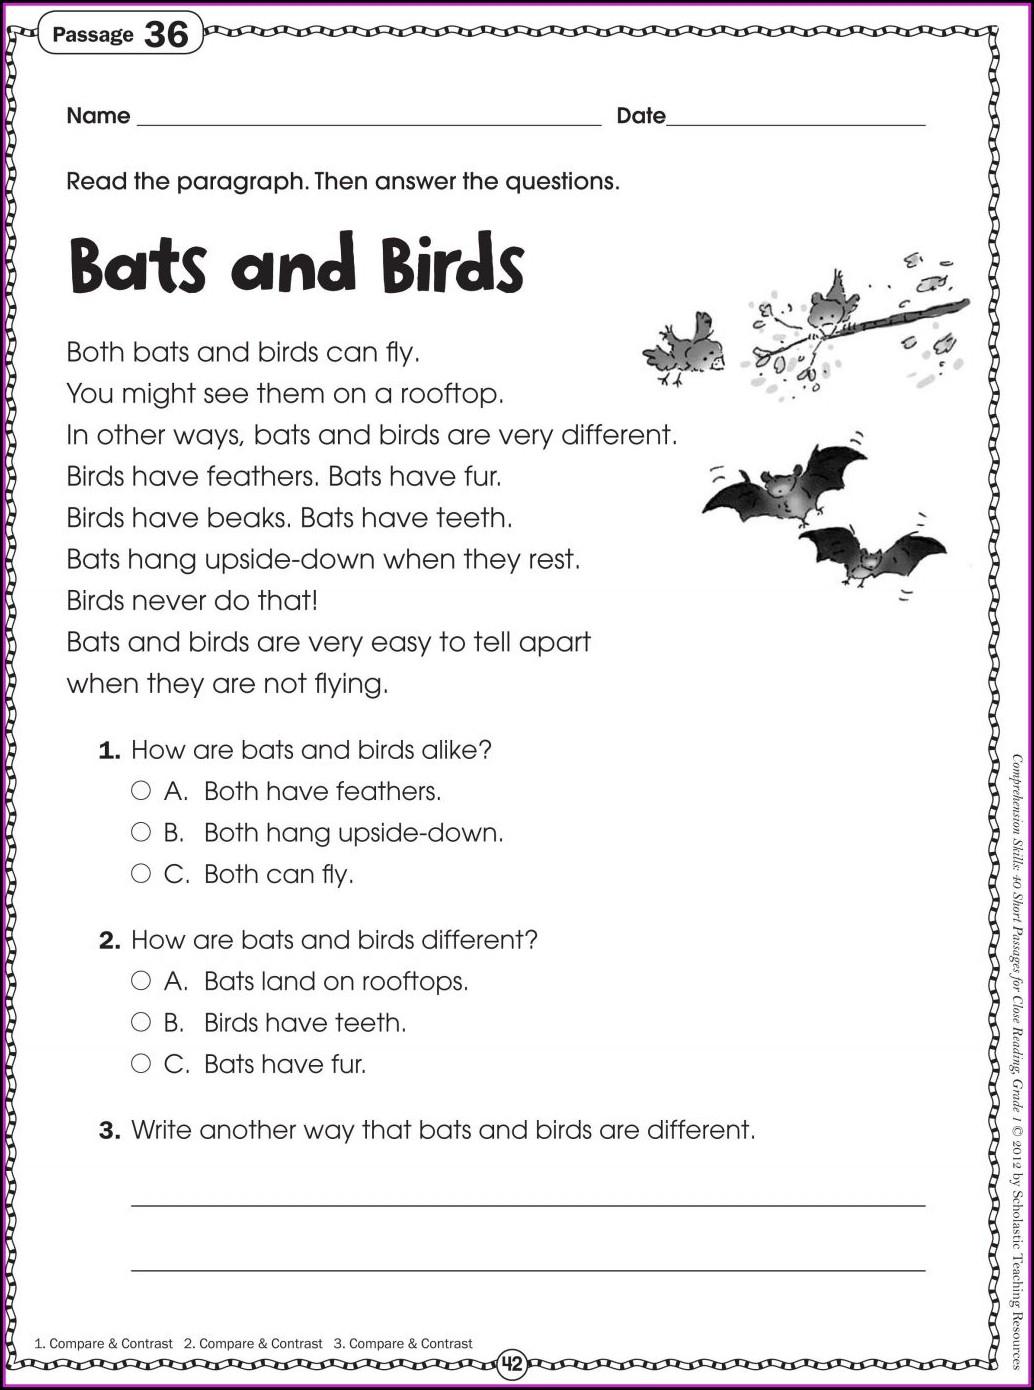 Free Printable Grade 5 English Comprehension Worksheets